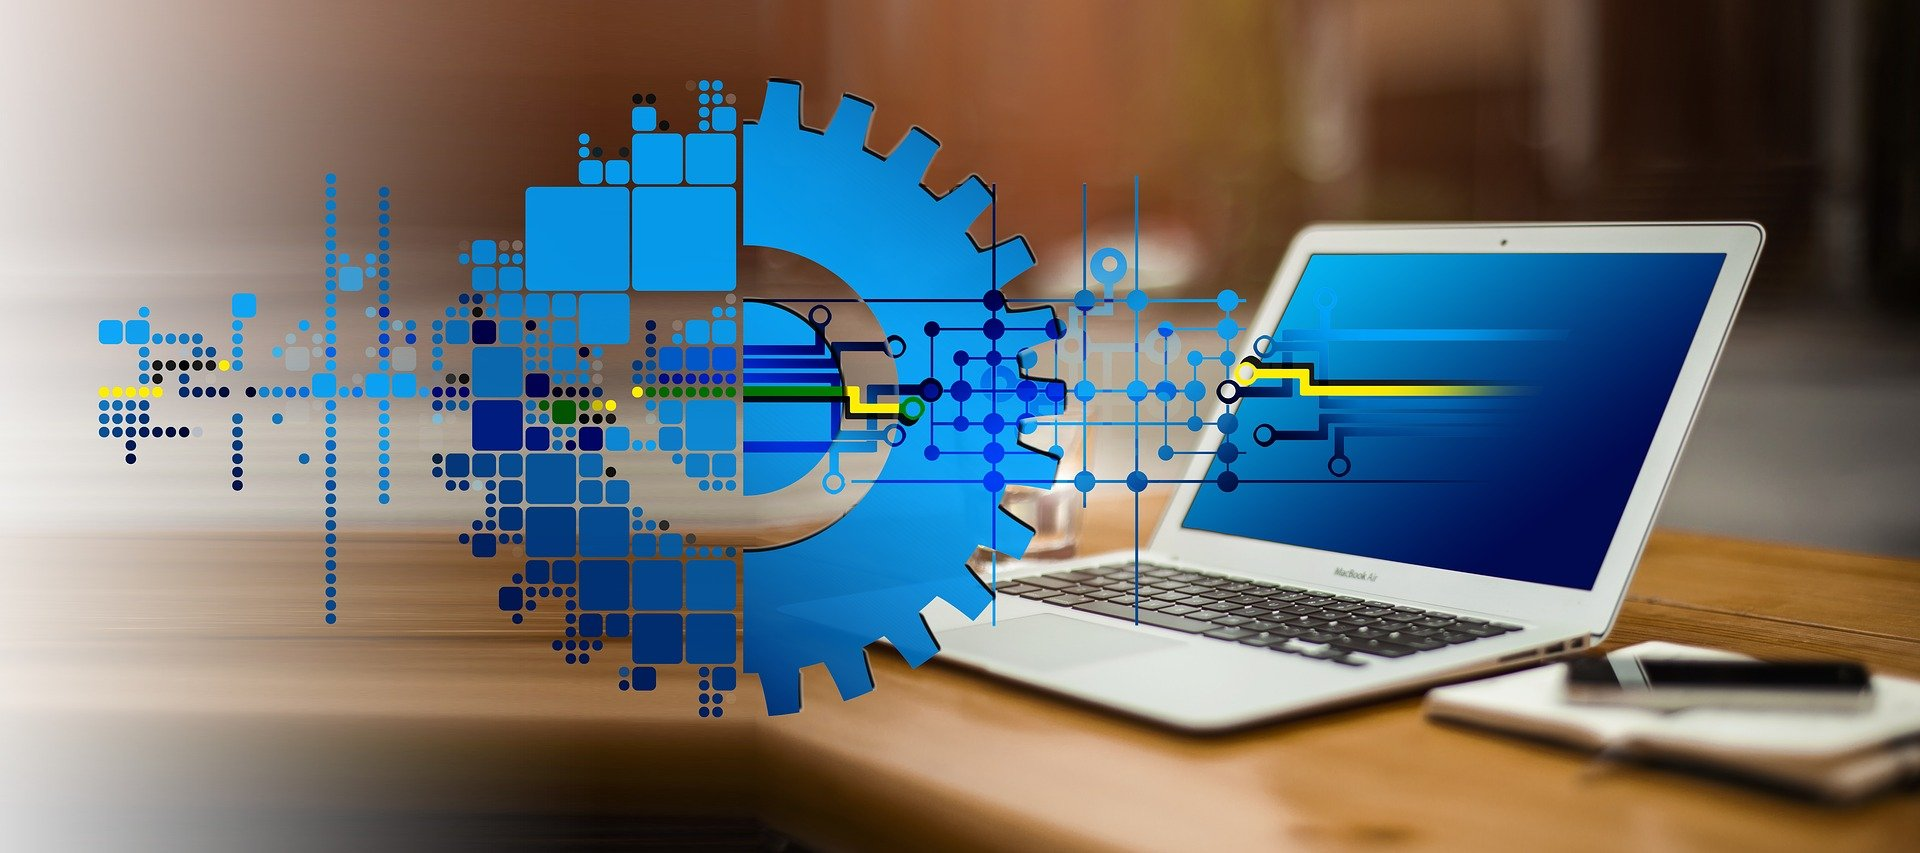 7 Ways In Which DevOps Can HelpWith Digital Transformation